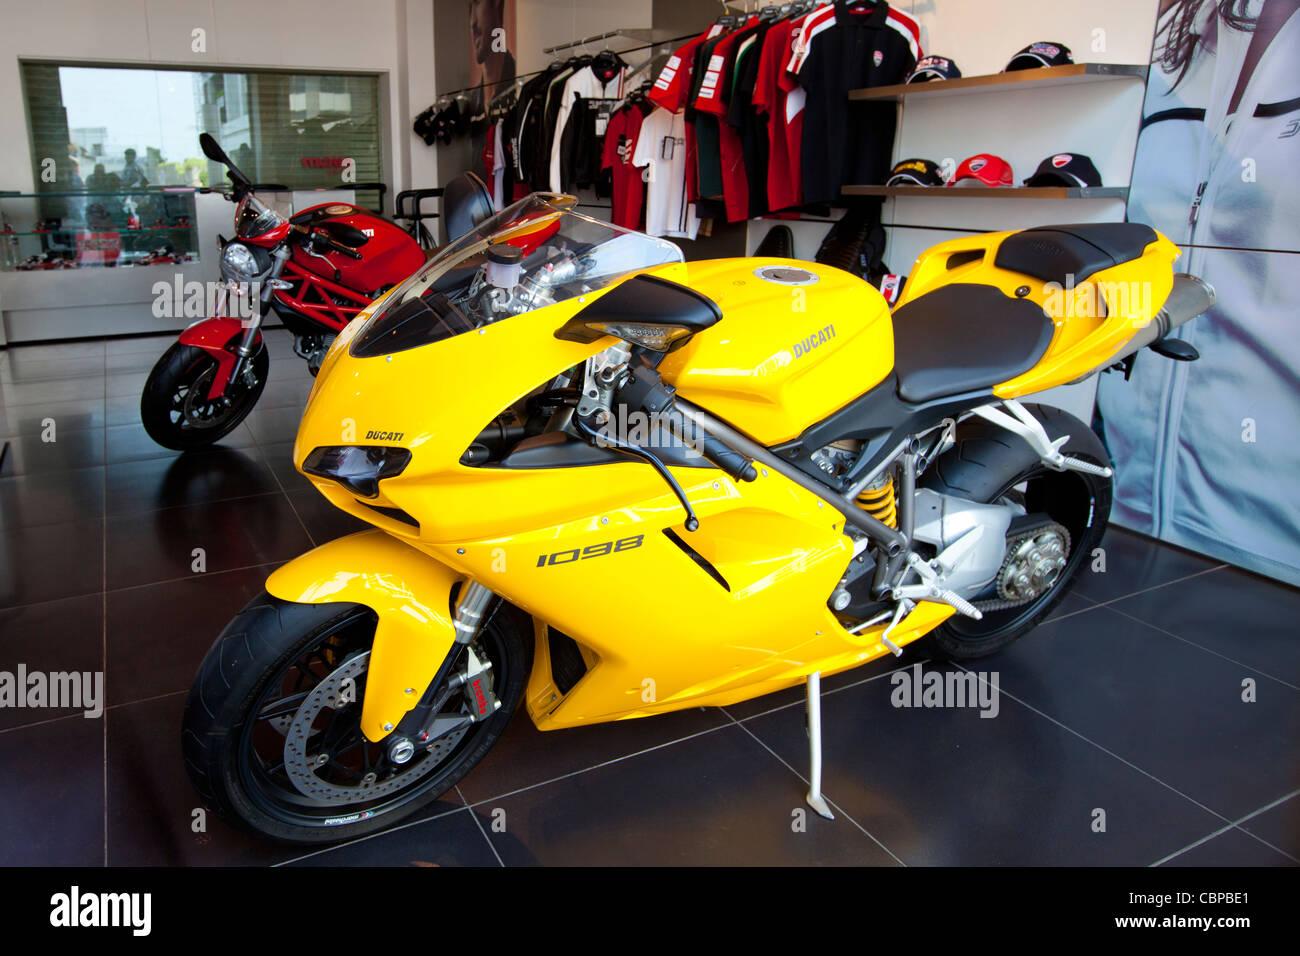 Ducati 1098 motorcycle in dealership showroom in Worli district of Mumbai, formerly Bombay, Maharashtra, India - Stock Image